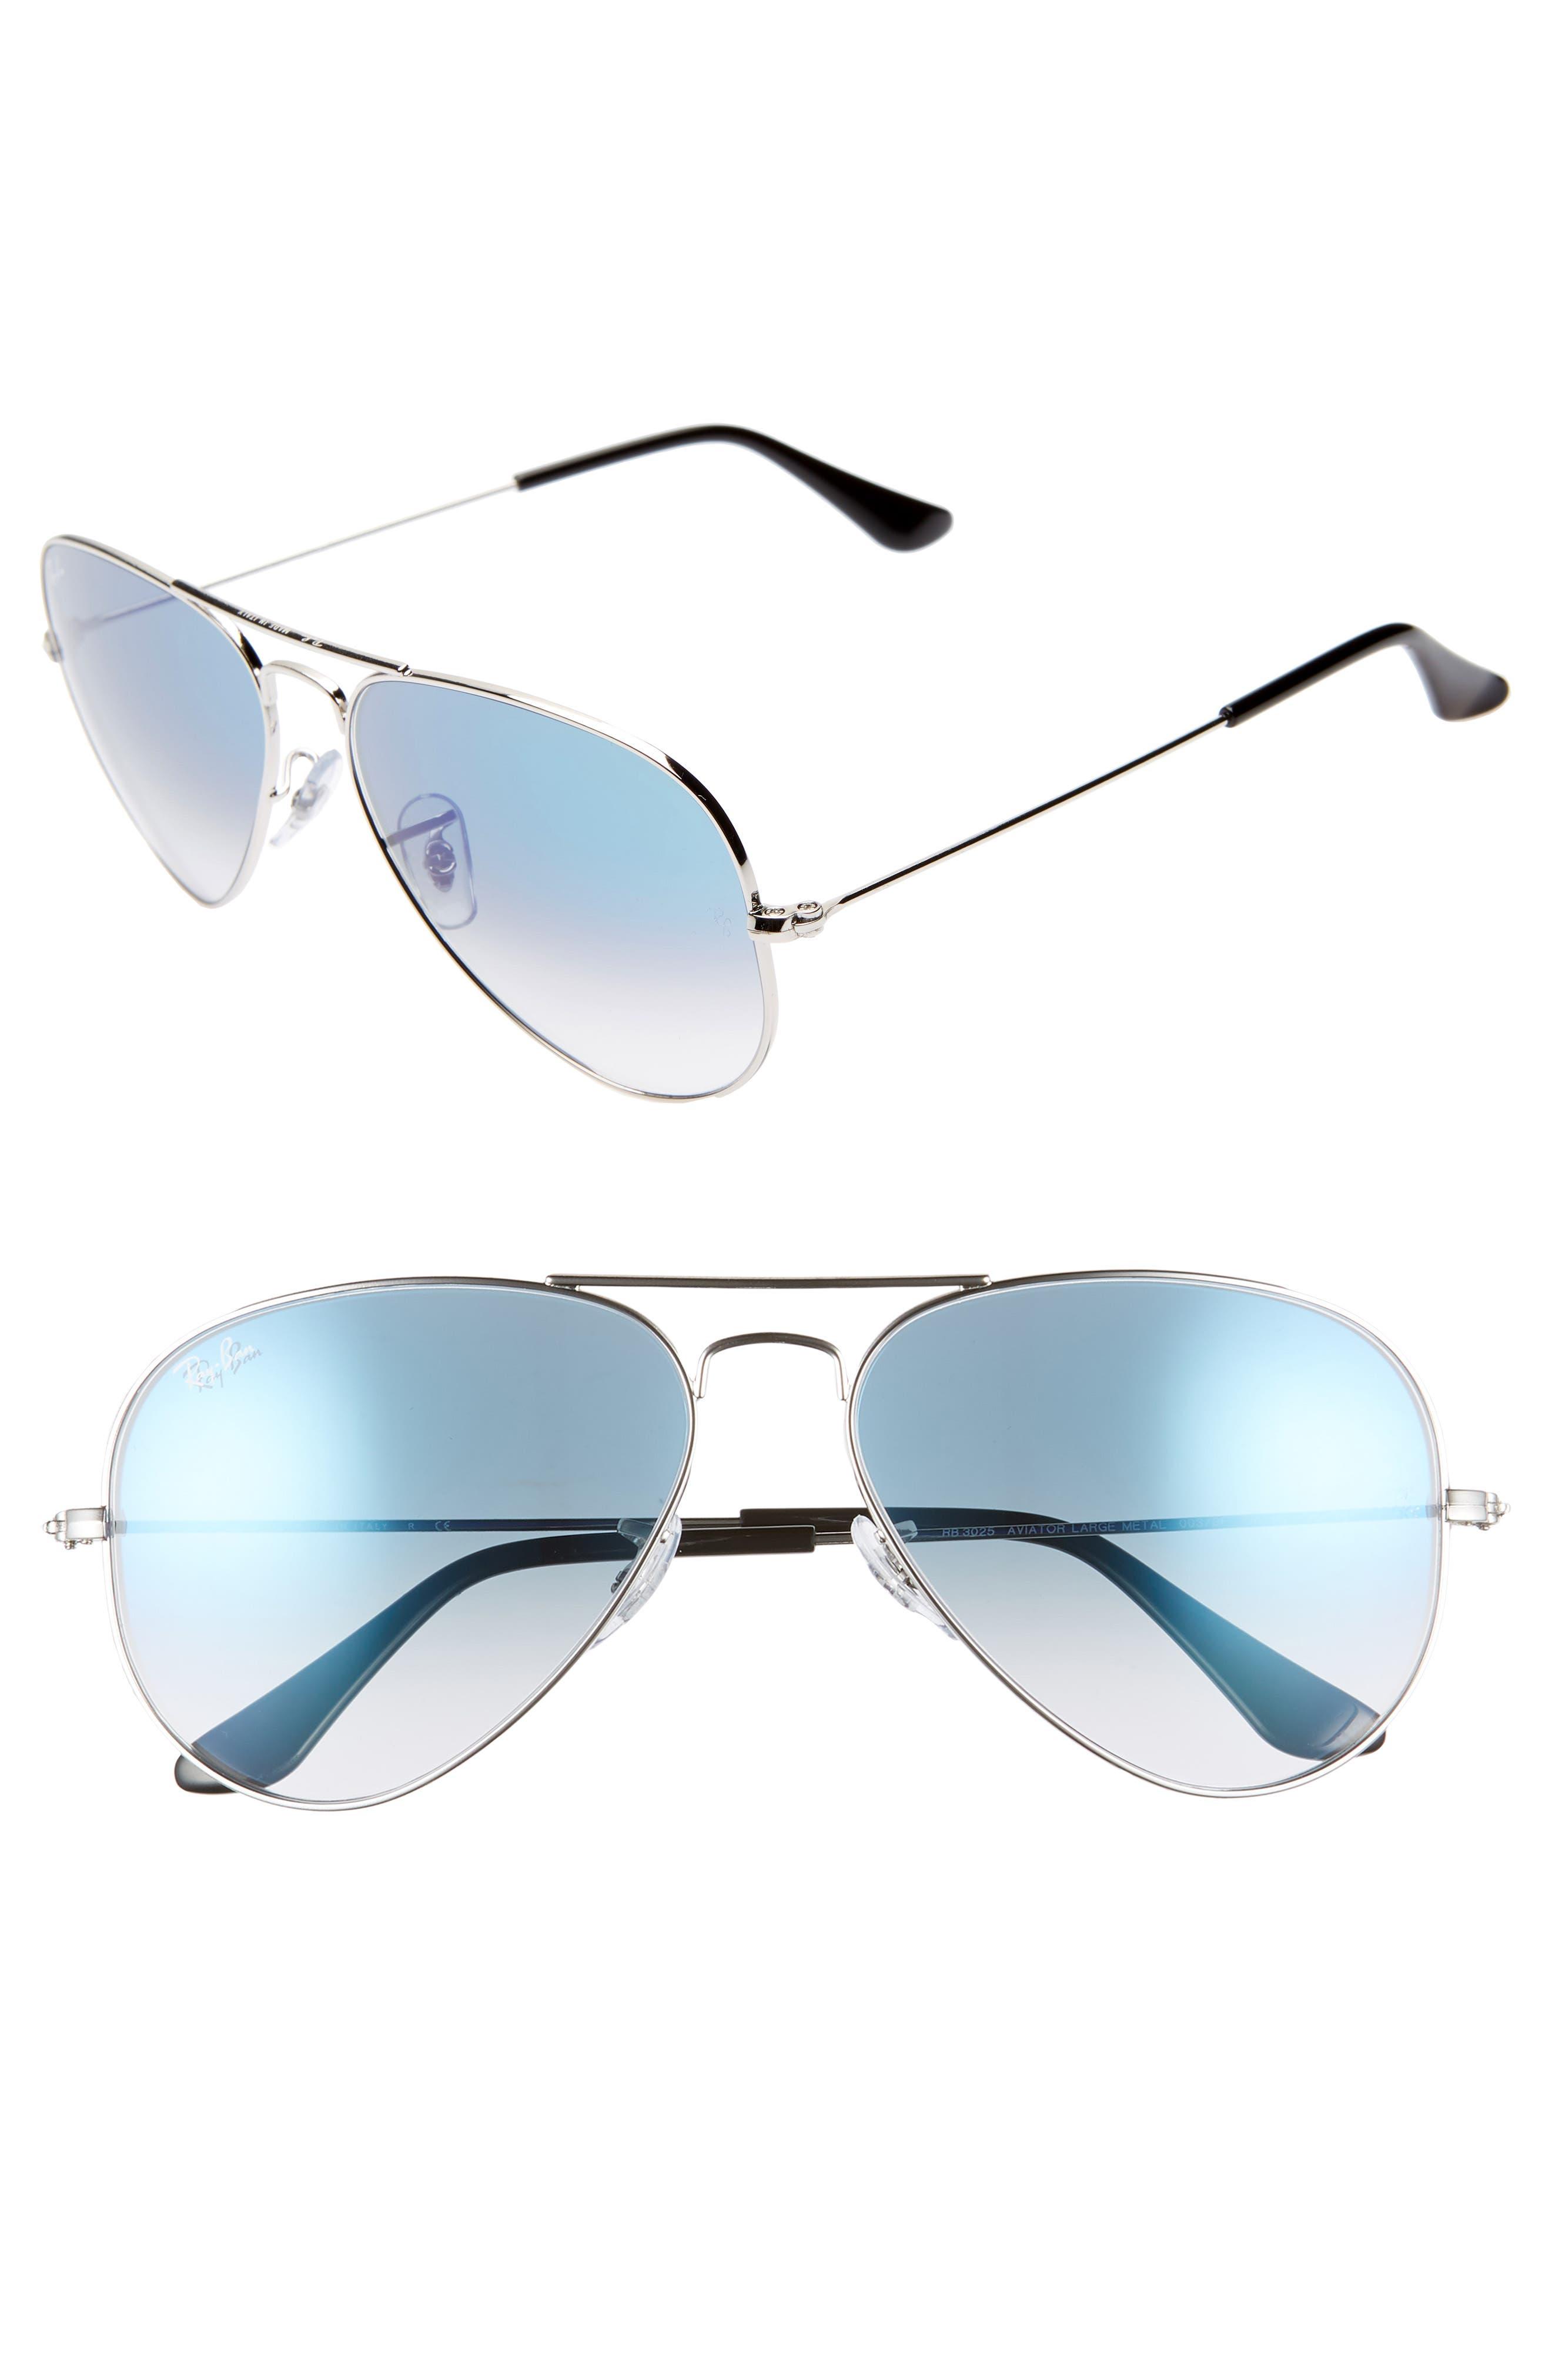 Ray-Ban 5m Gradient Aviator Sunglasses - Silver/ Blue Gradient